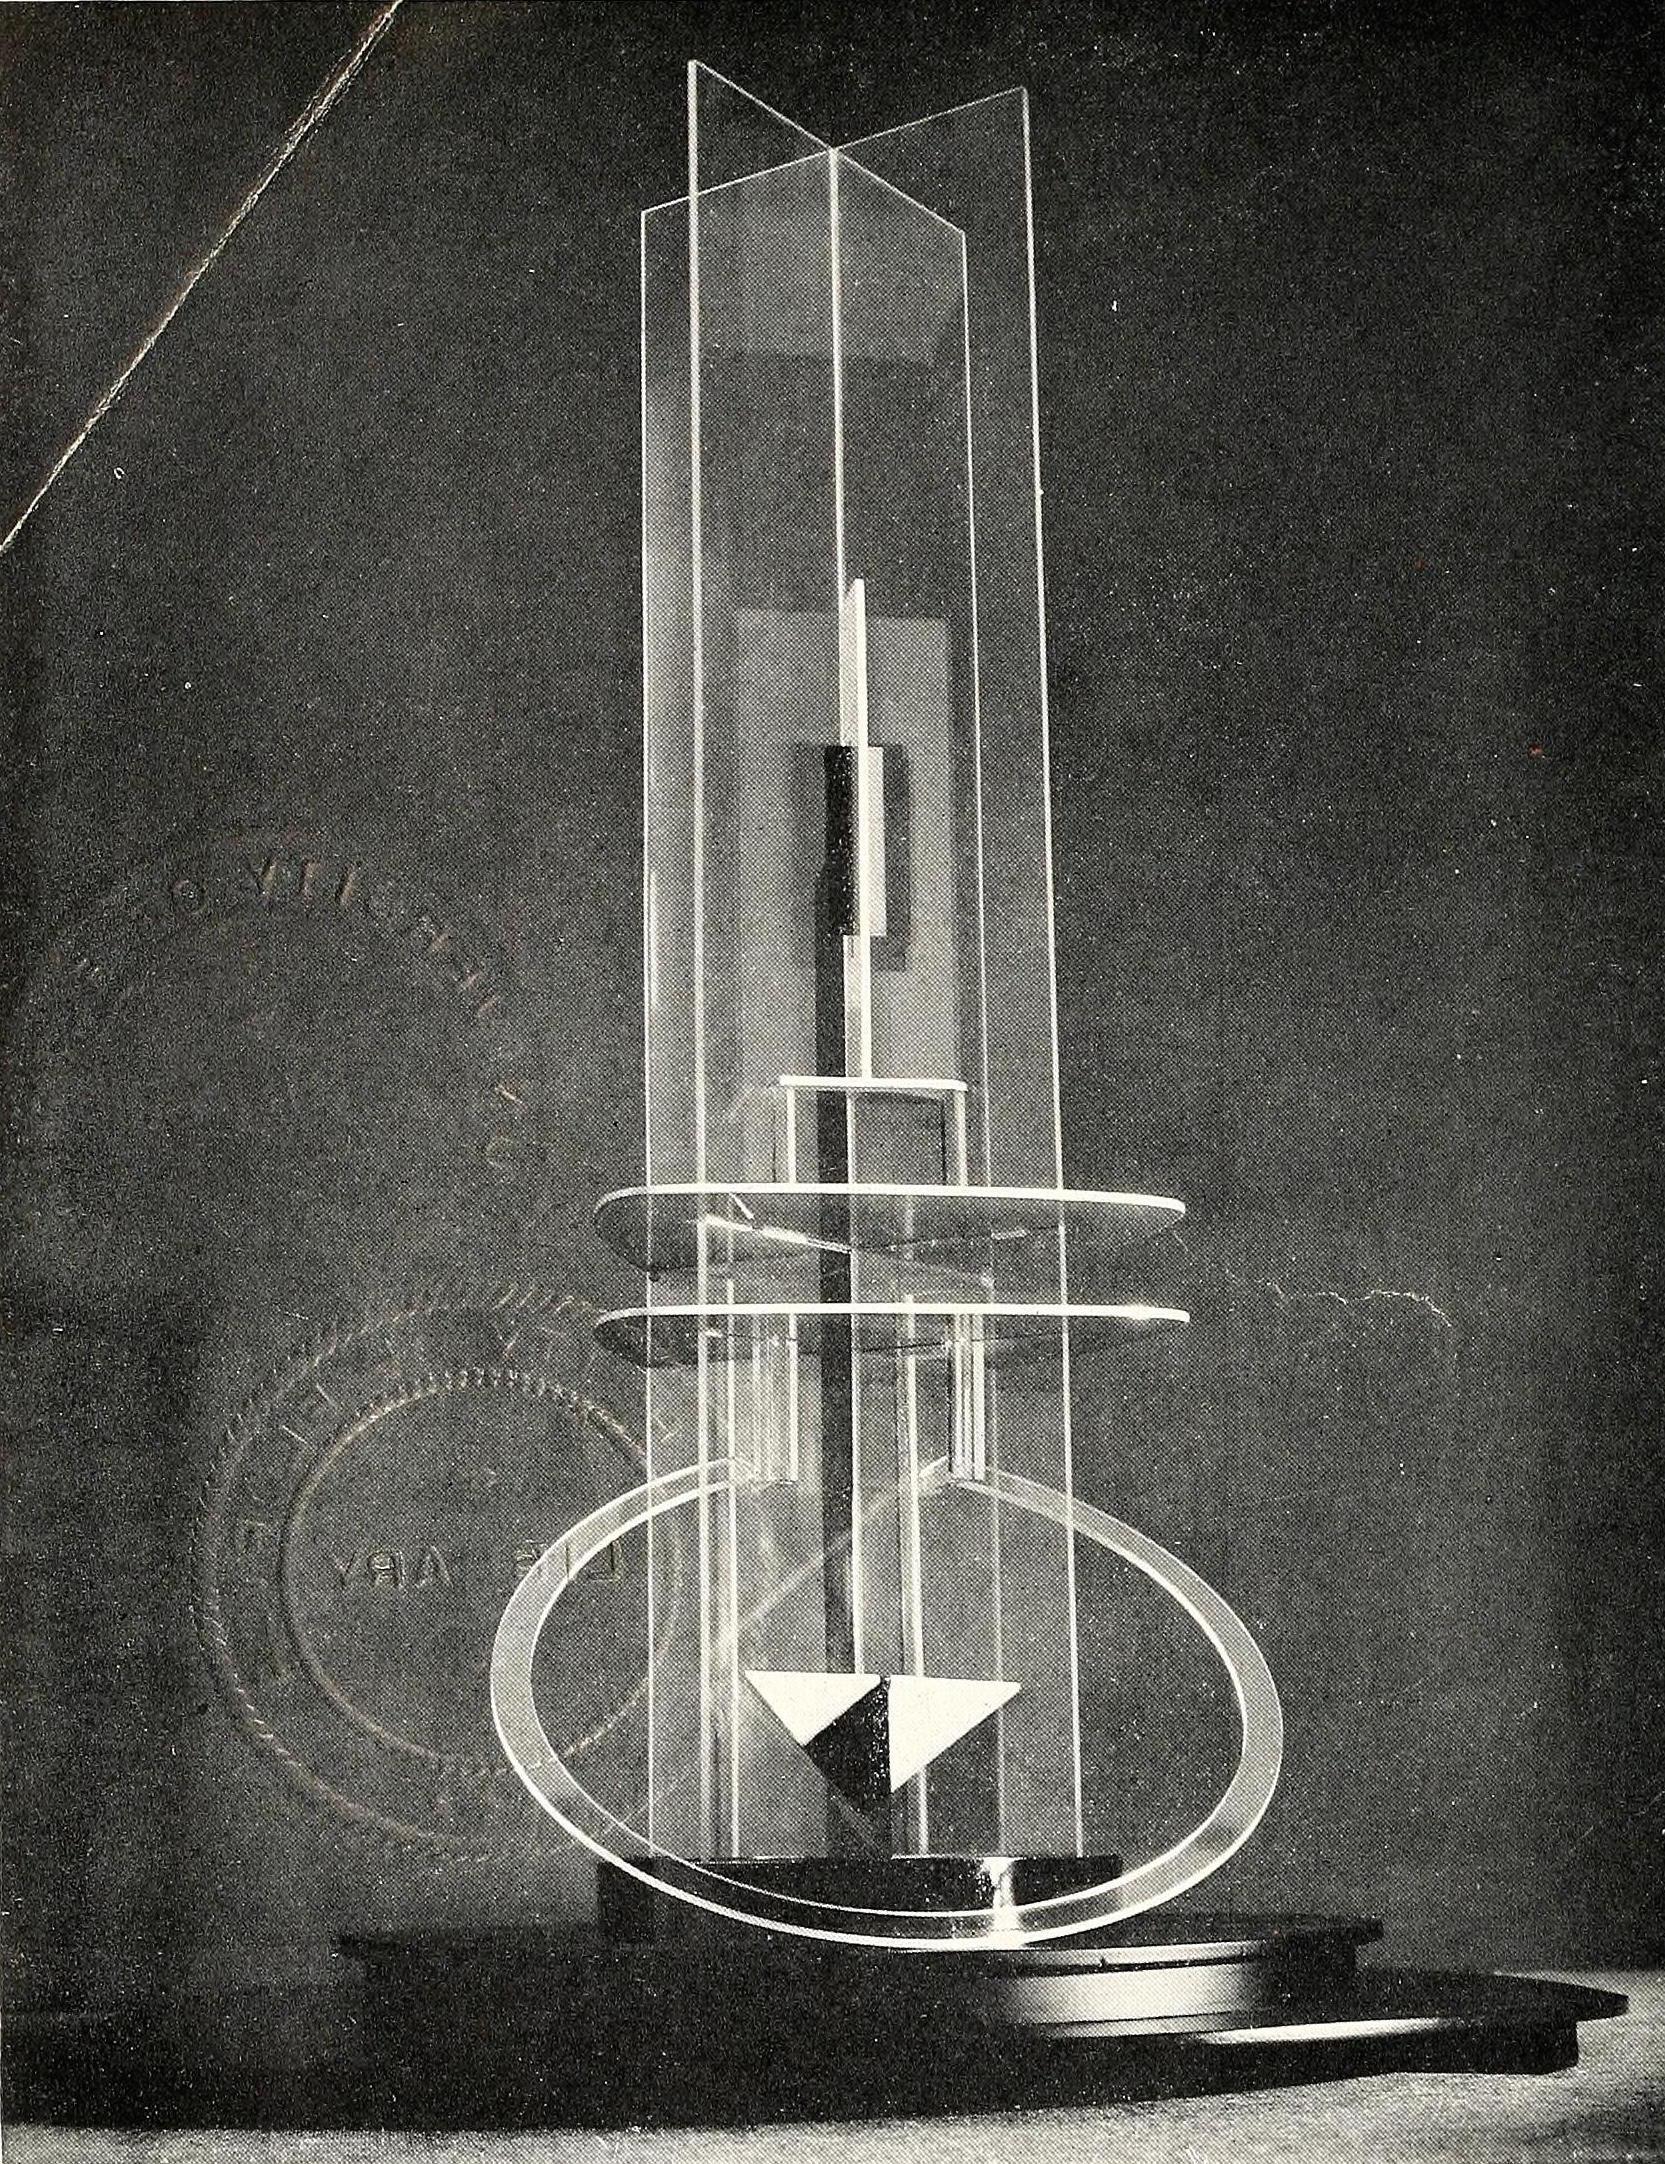 Naum Gabo, Column (1923), Glass, plastic, metal, wood, 41 inches high